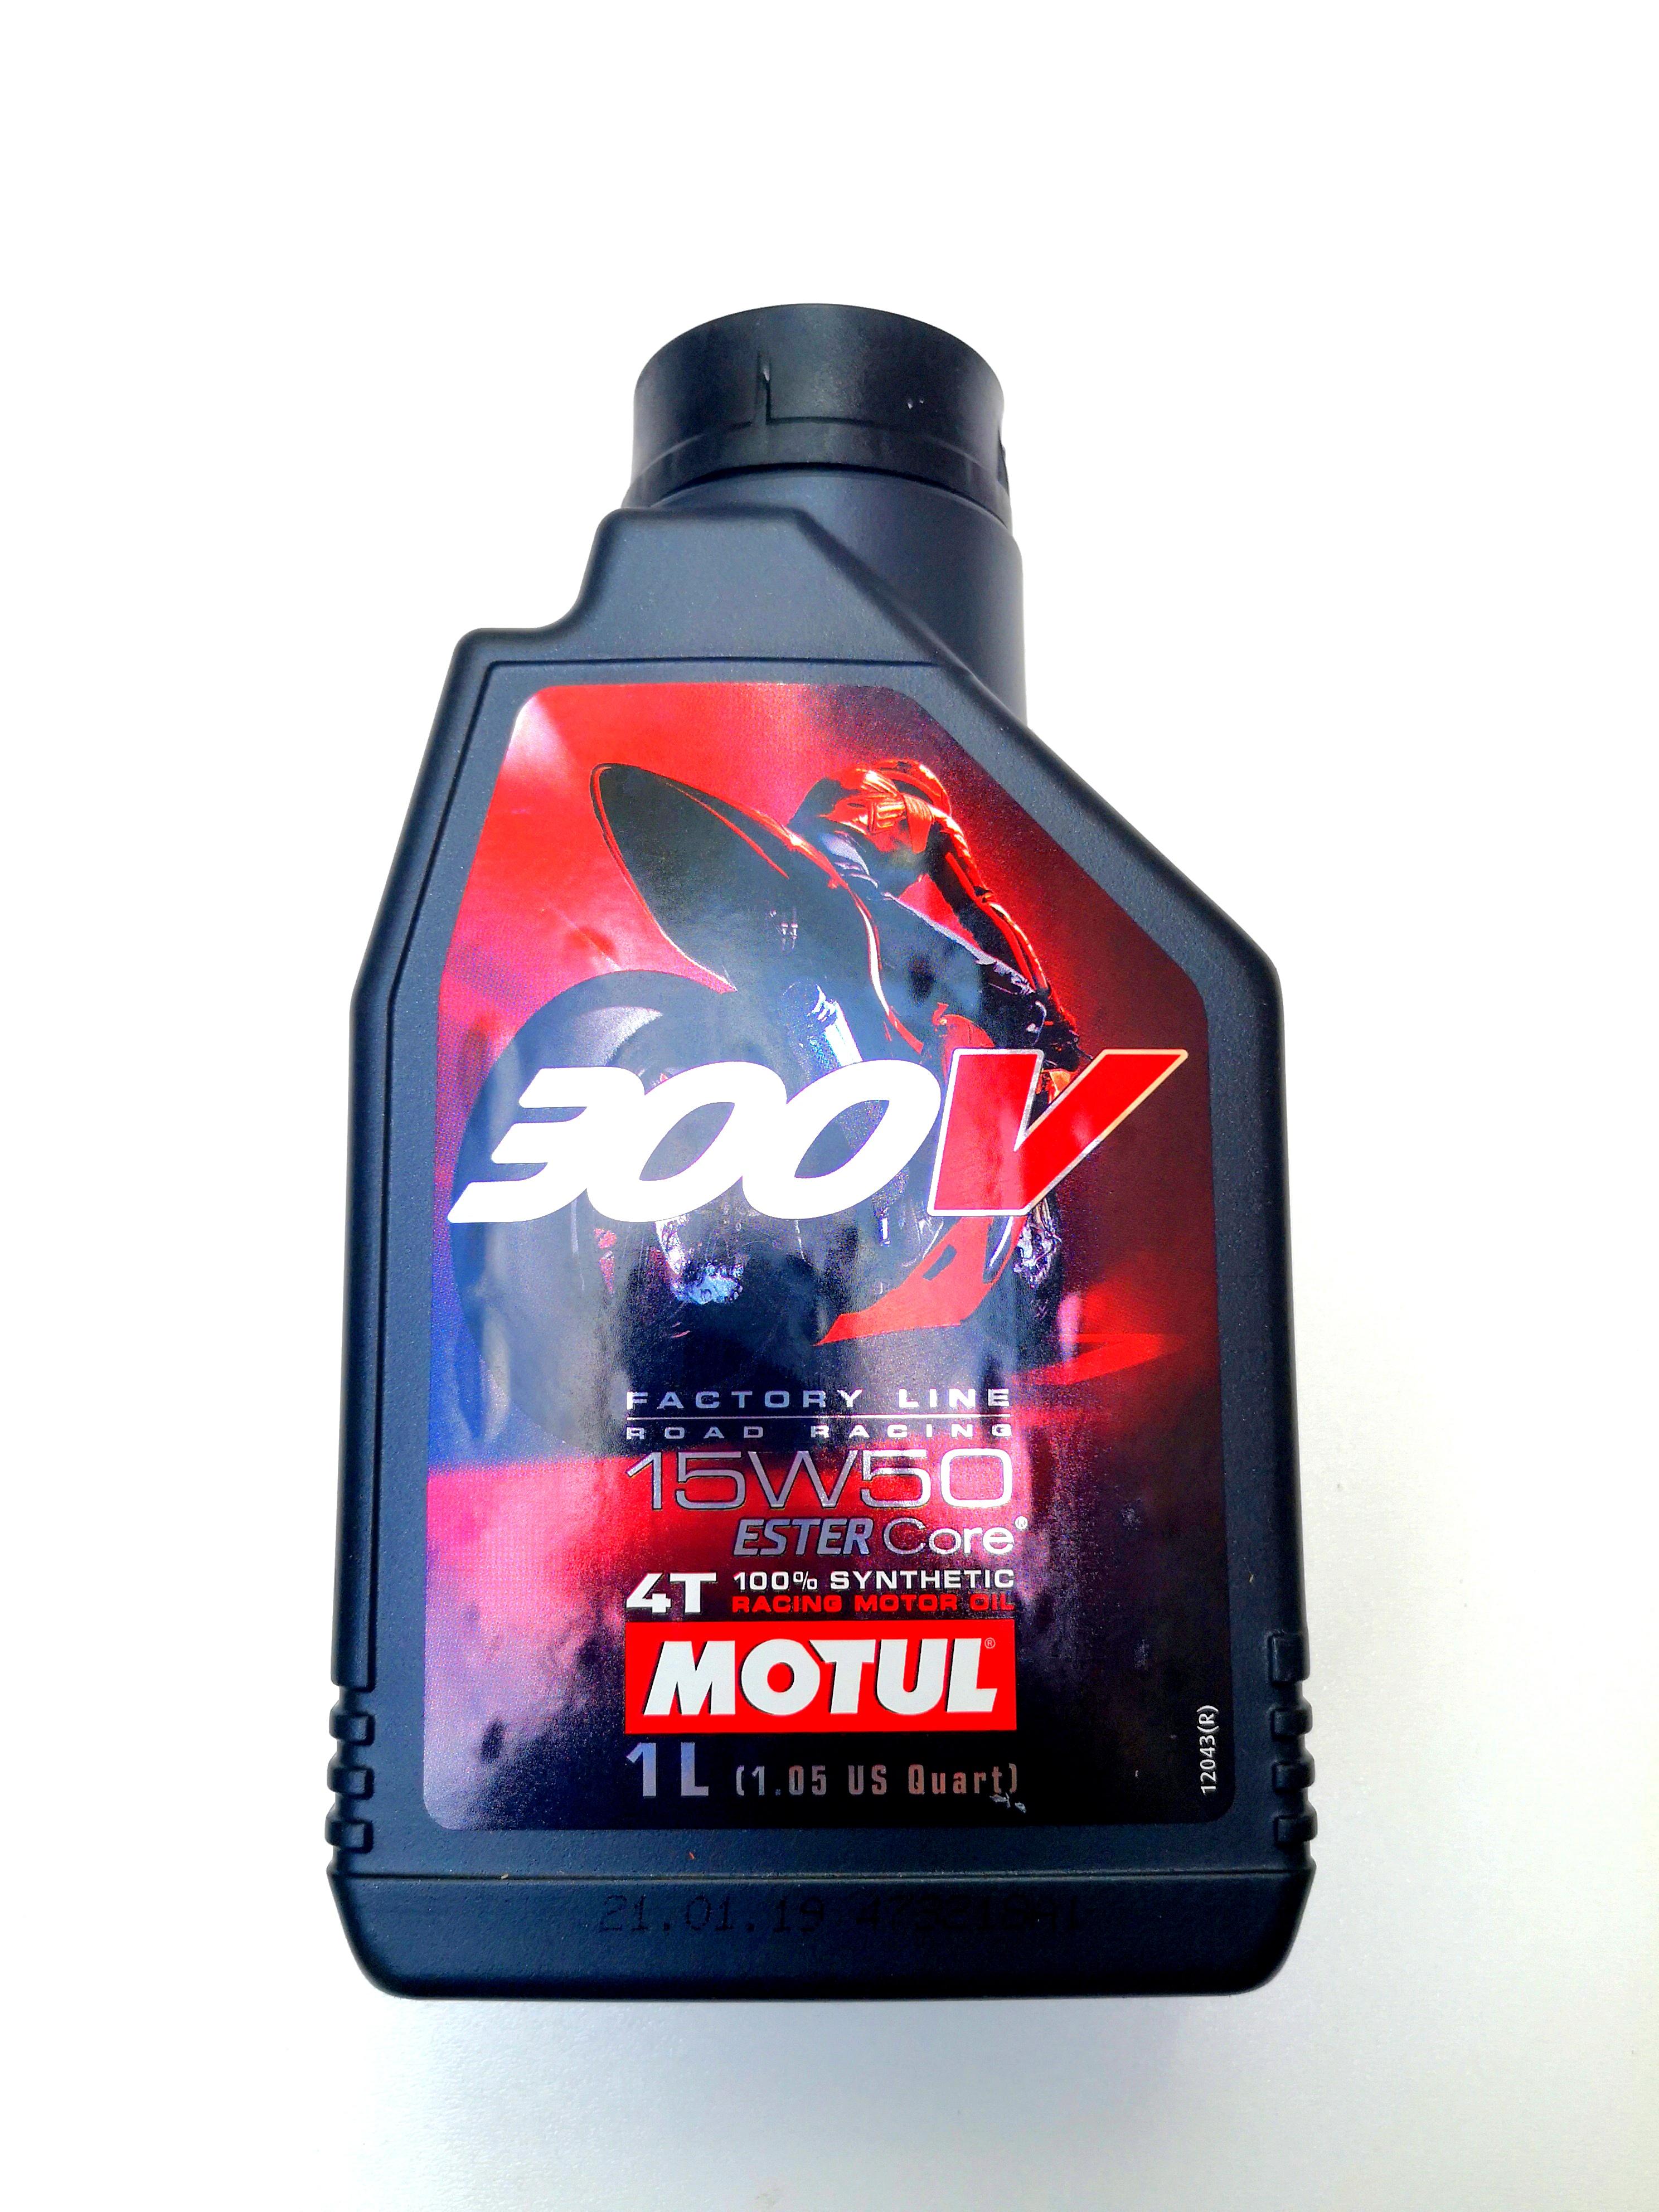 MOTUL 300V ROAD RACING per MOTO 4 TEMPI - SAE 15W50 - MOTOFORNITURE GF